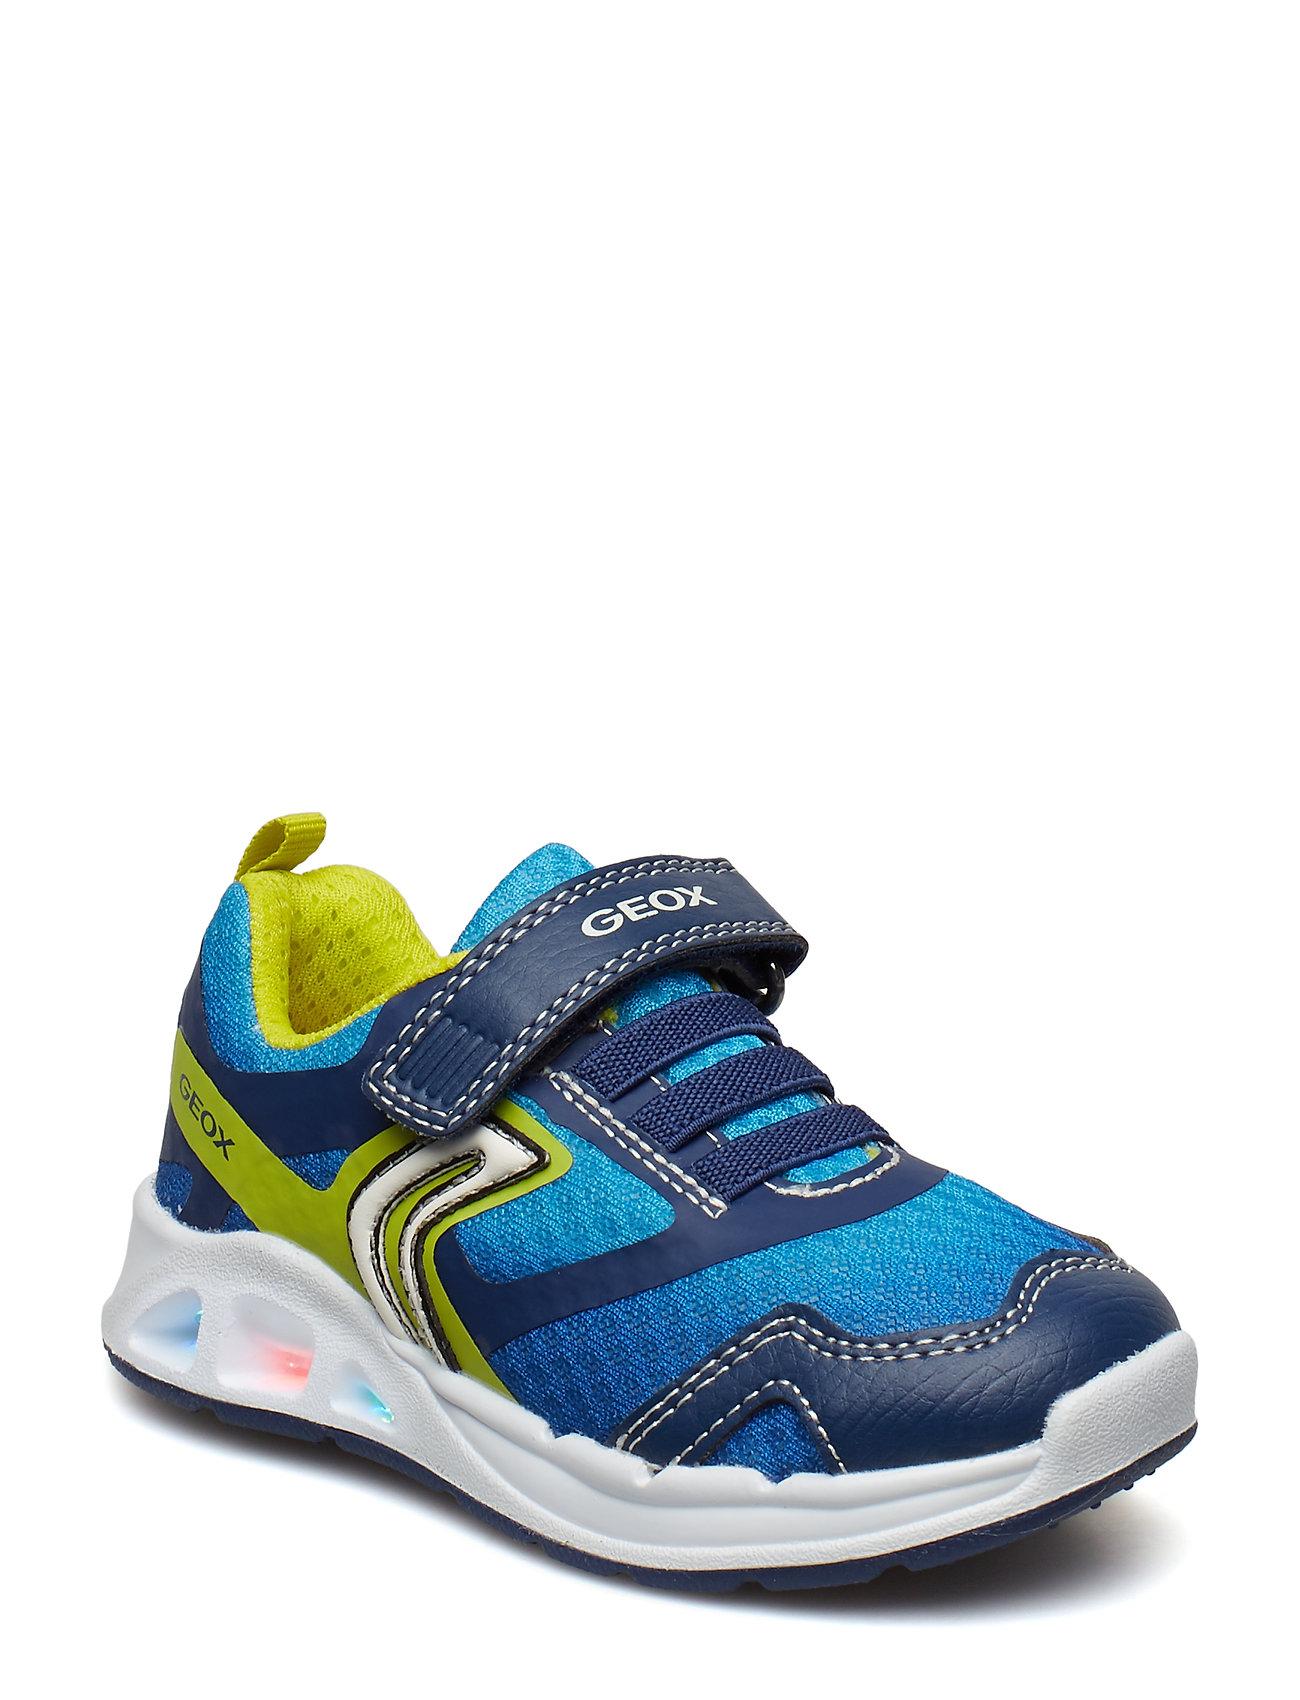 b0940b7577b NAVY/LIME GEOX J Dakin Boy sneakers for børn - Pashion.dk